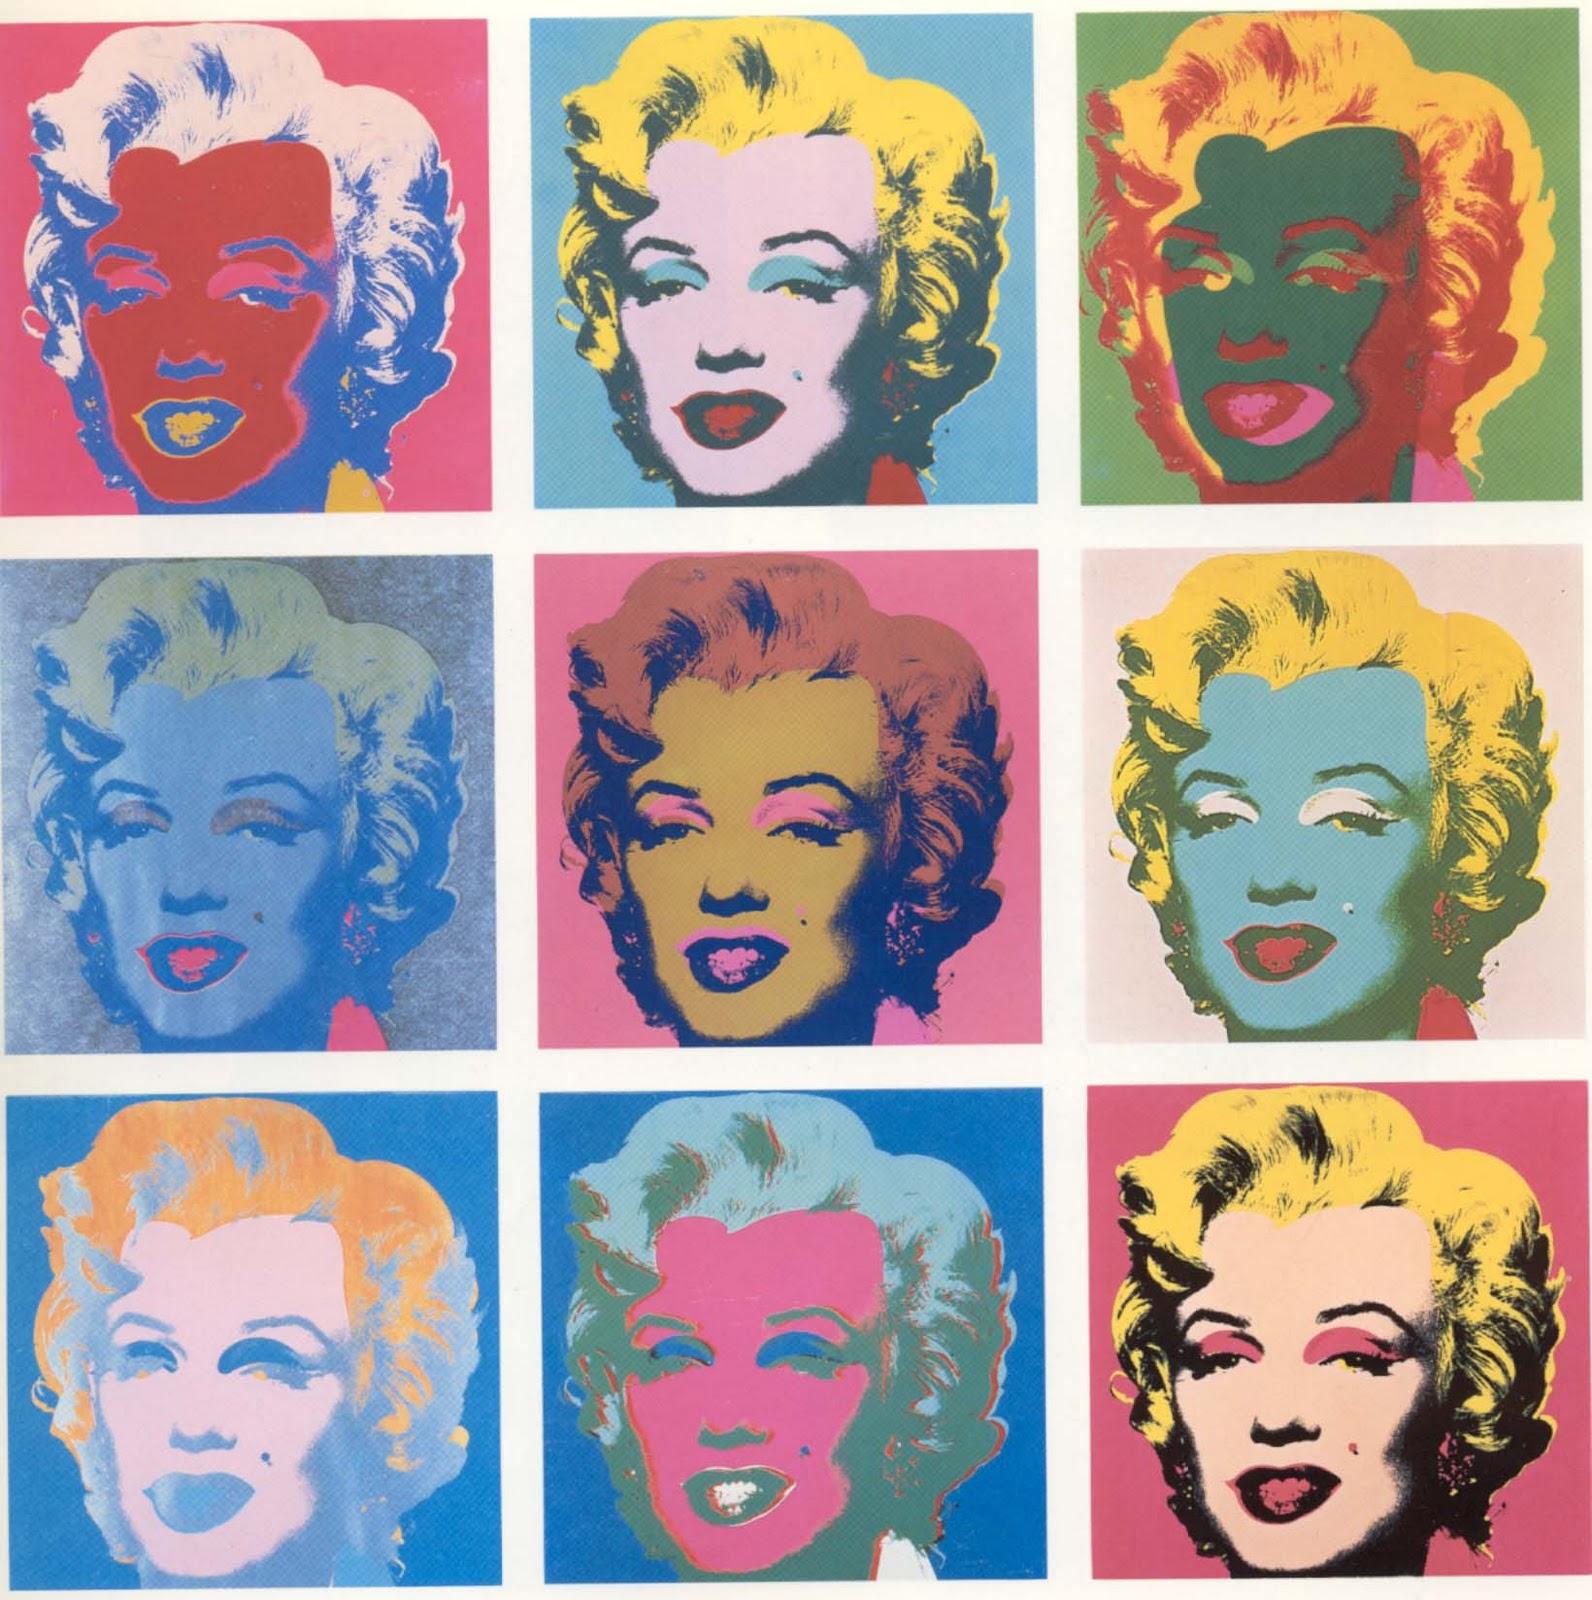 http://1.bp.blogspot.com/-I4thDPL6iVs/TZ7bCC-XKlI/AAAAAAAAAFw/yjm6filFVUs/s1600/quotes-by-marilyn-monroe.jpg